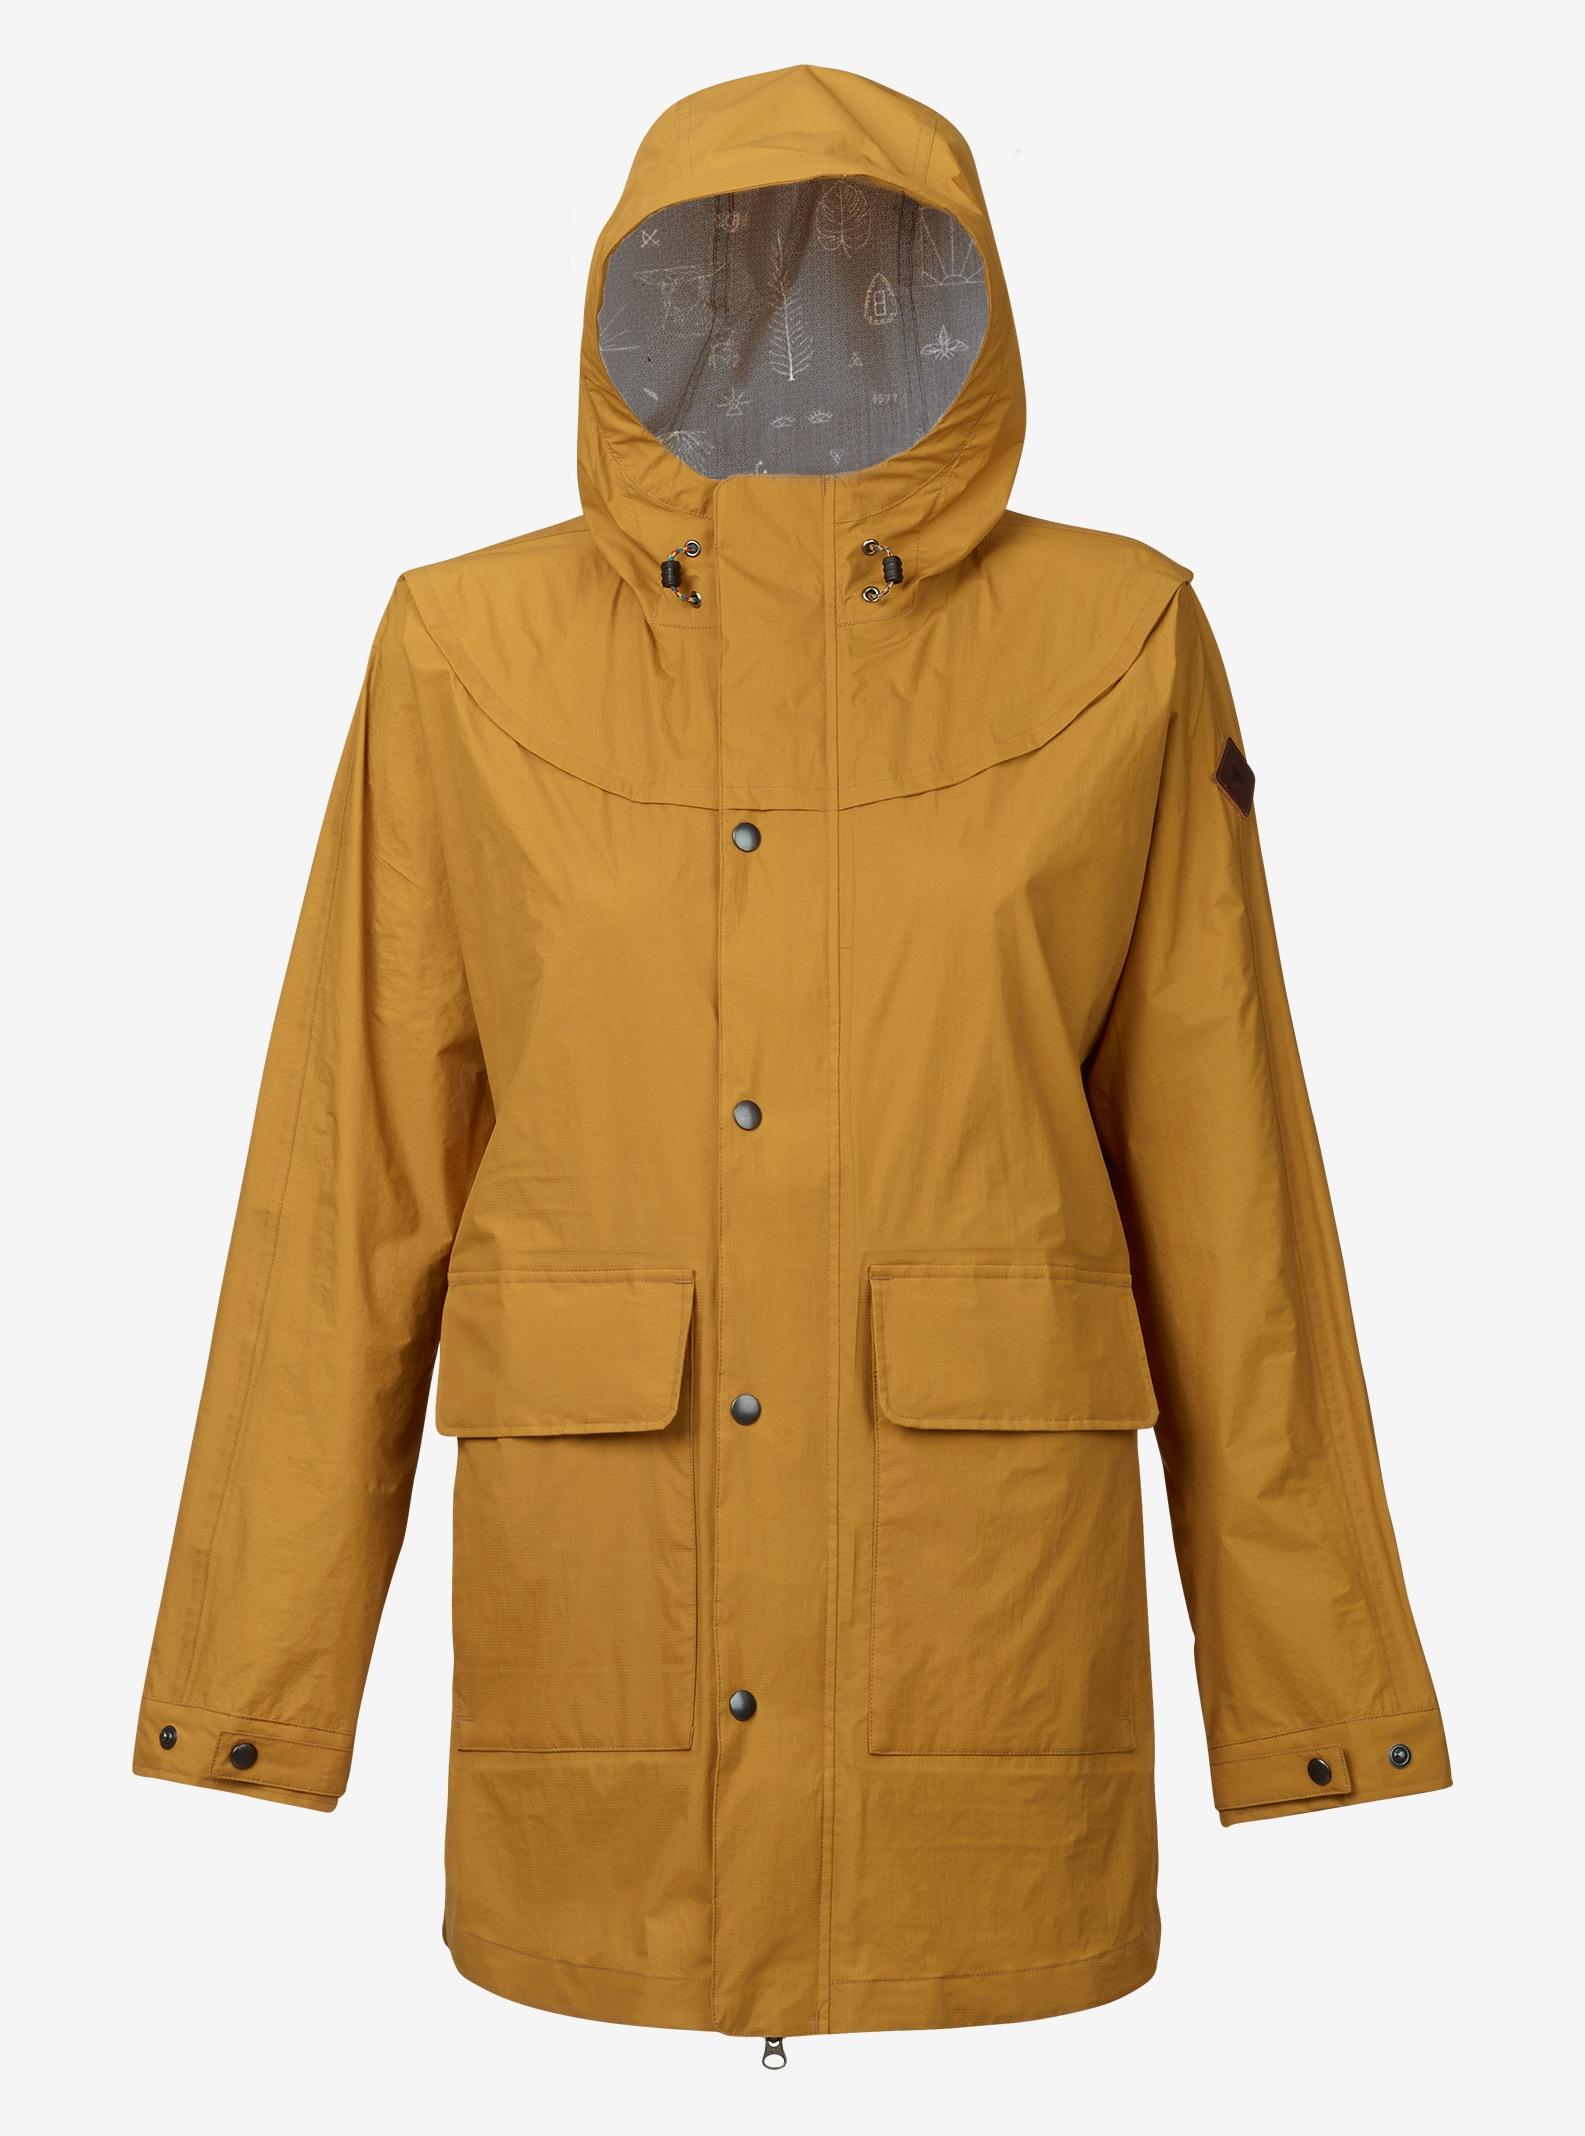 Burton Flare Parka Rain Jacket shown in Golden Yellow